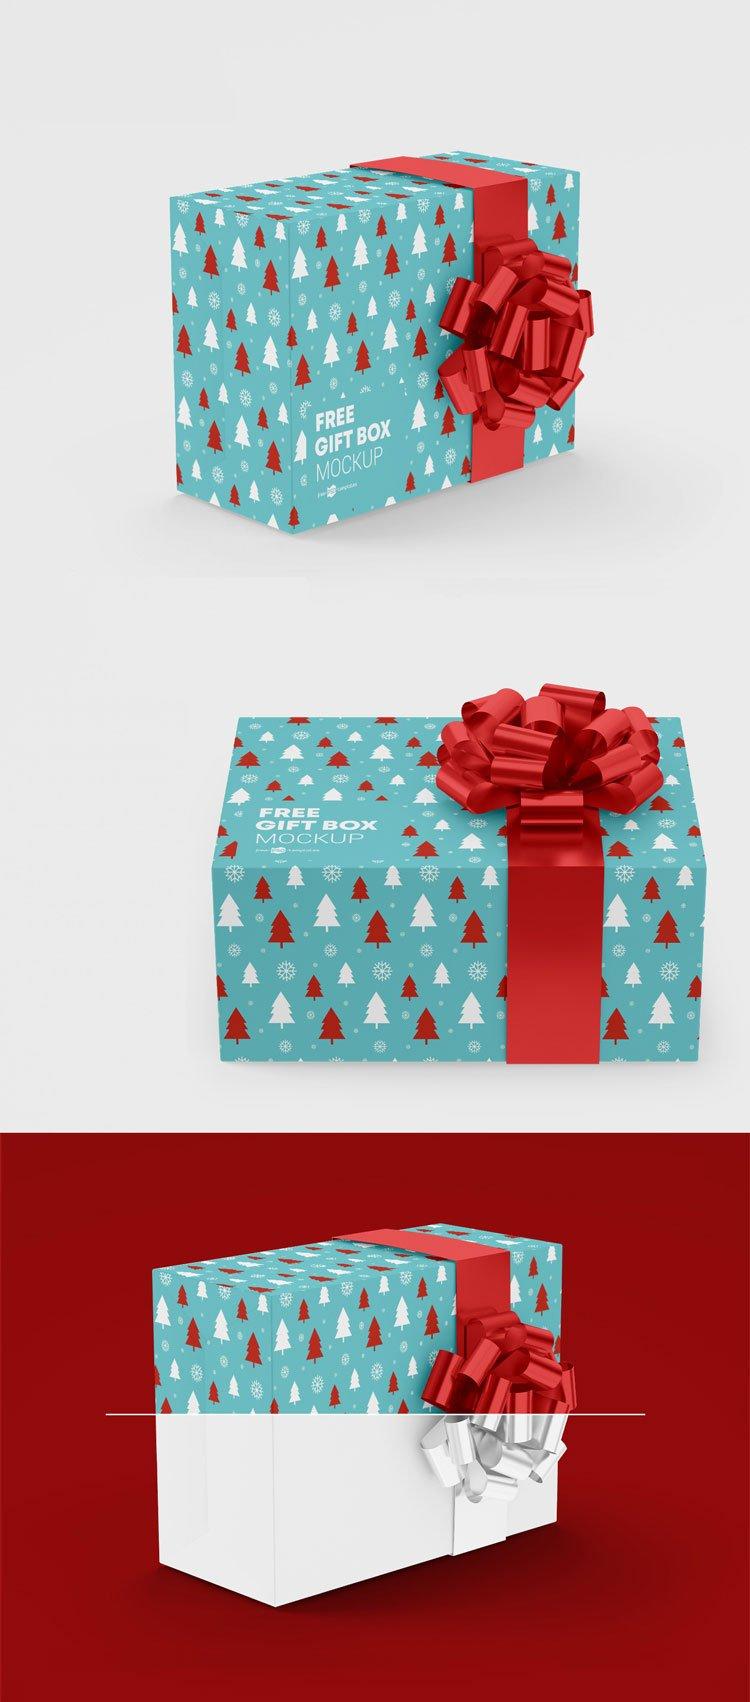 701+ Free Gift Box Mockup Mockups Design